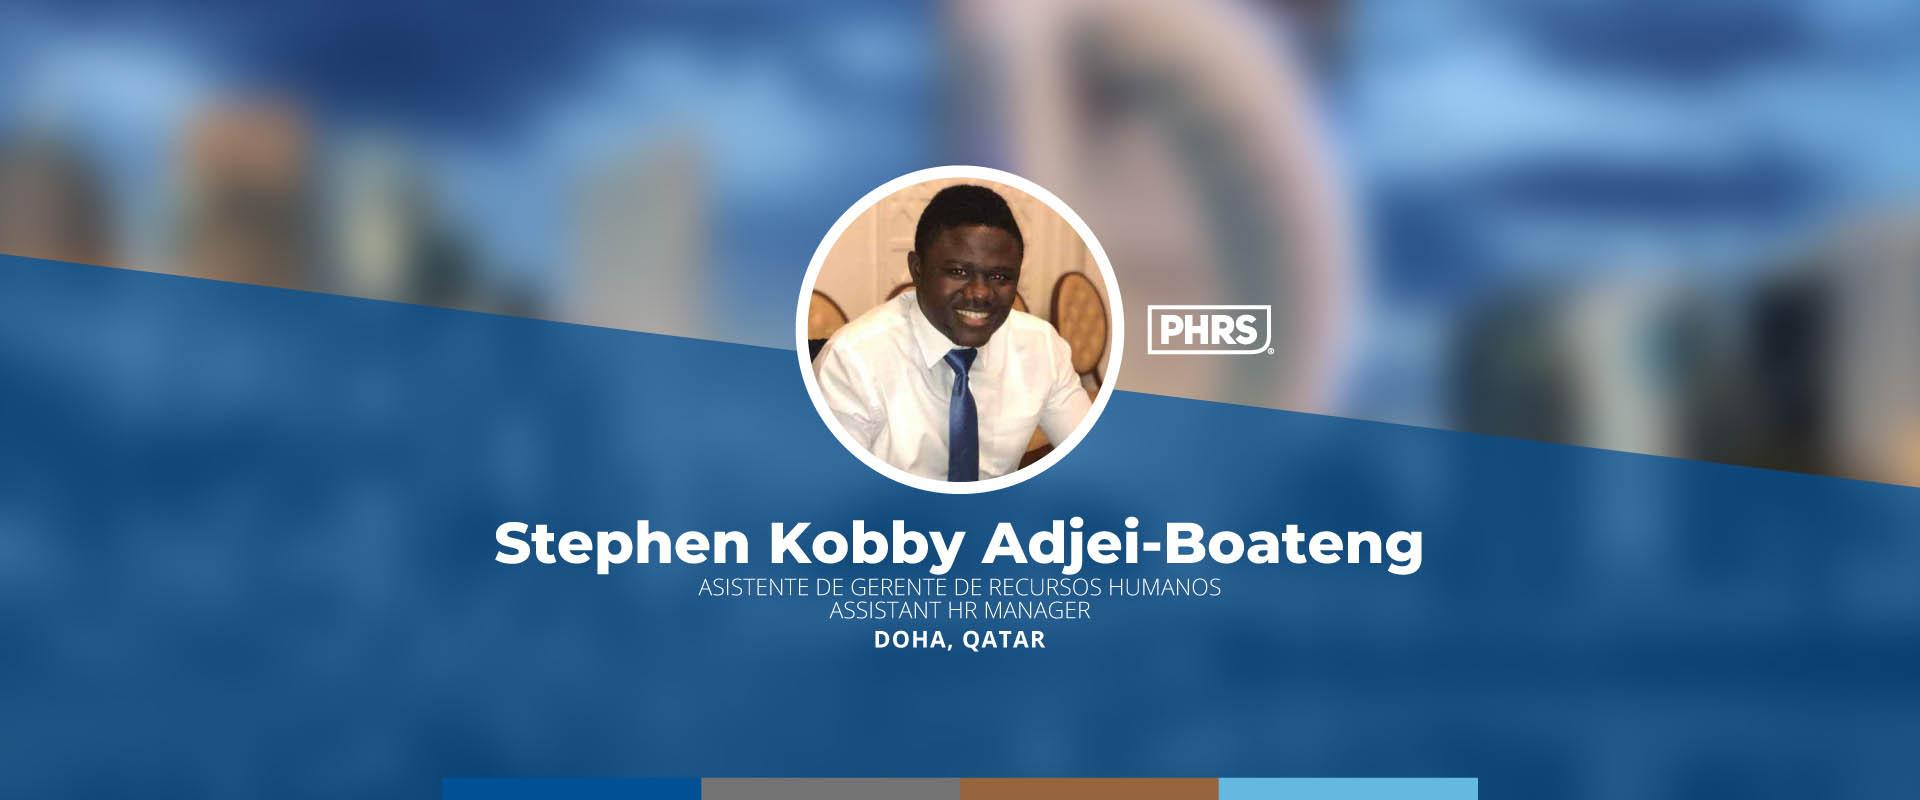 Experiences | Stephen Kobby Adjei-Boateng